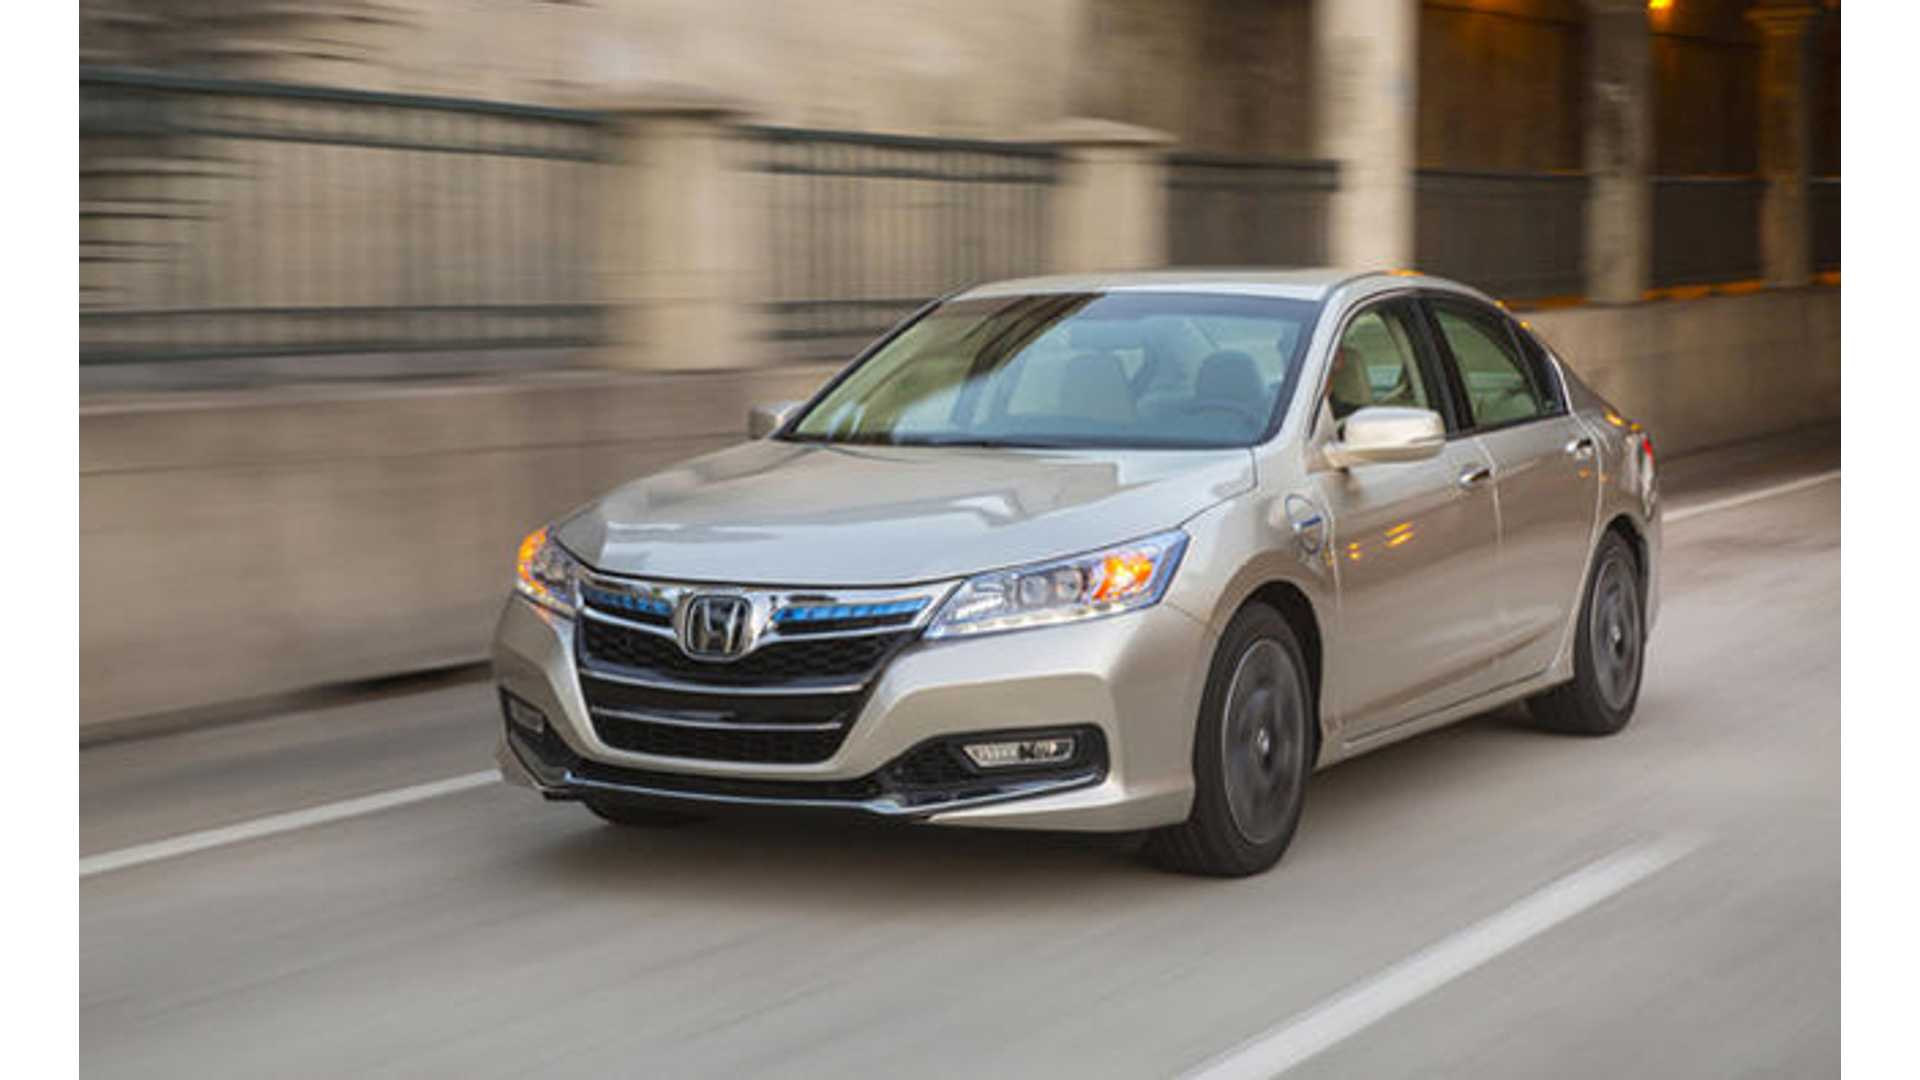 2017 Honda Accord Plug In Hybrid Priced At 39 780 13 Miles Of Range 115 Mpge